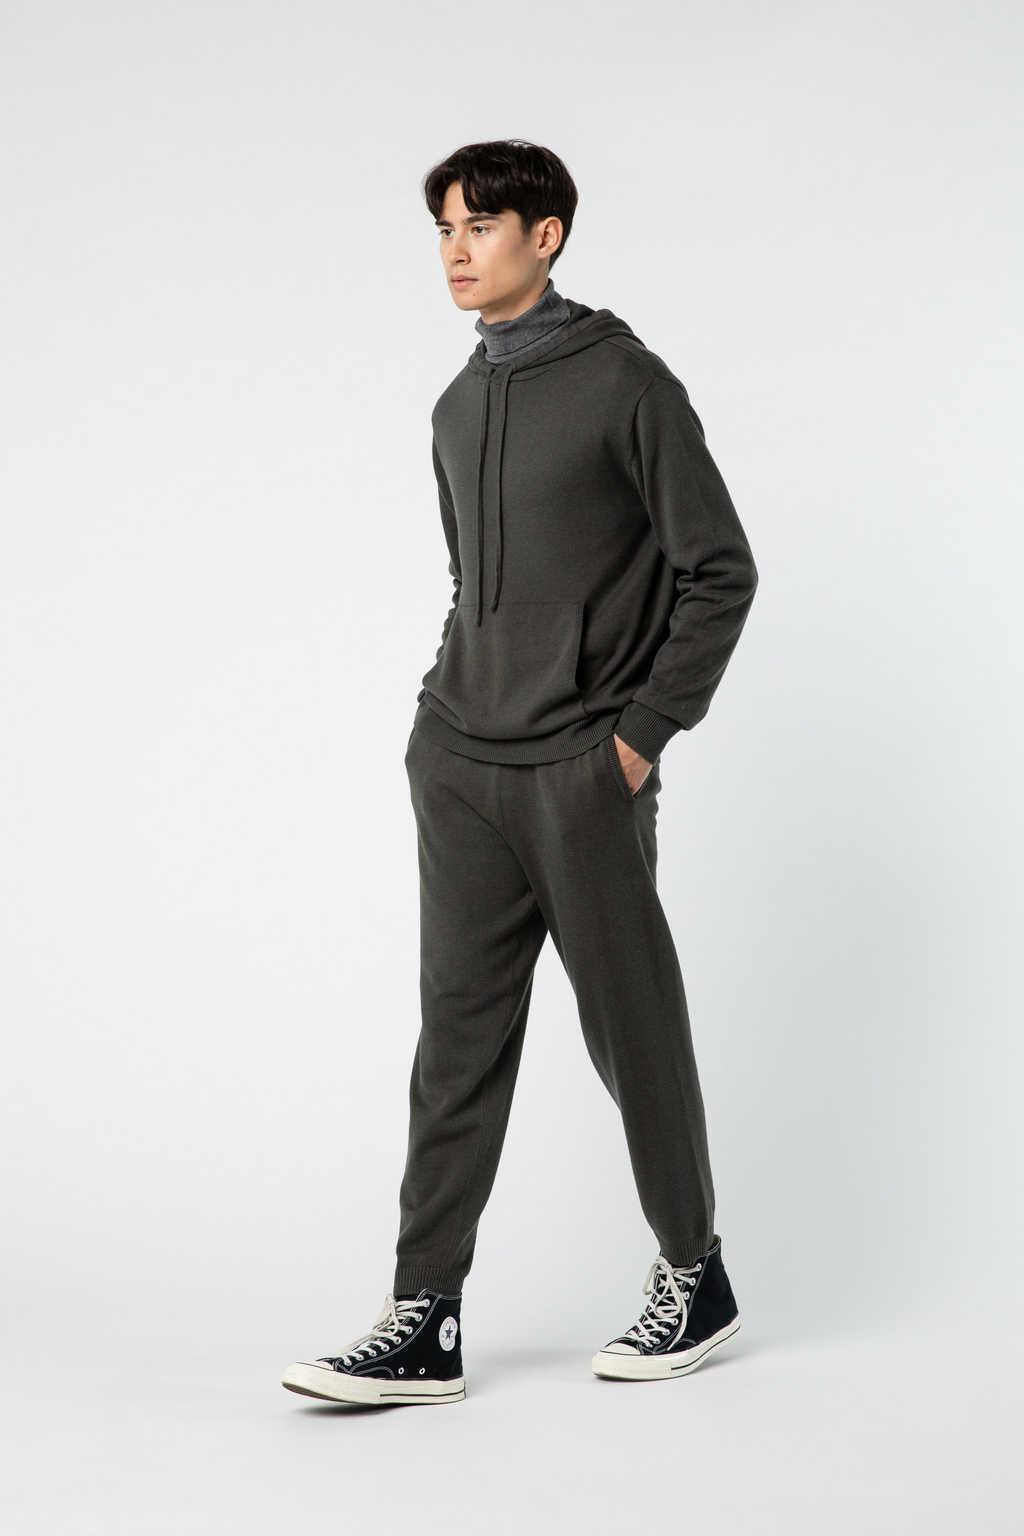 Sweater 2756 Olive 3